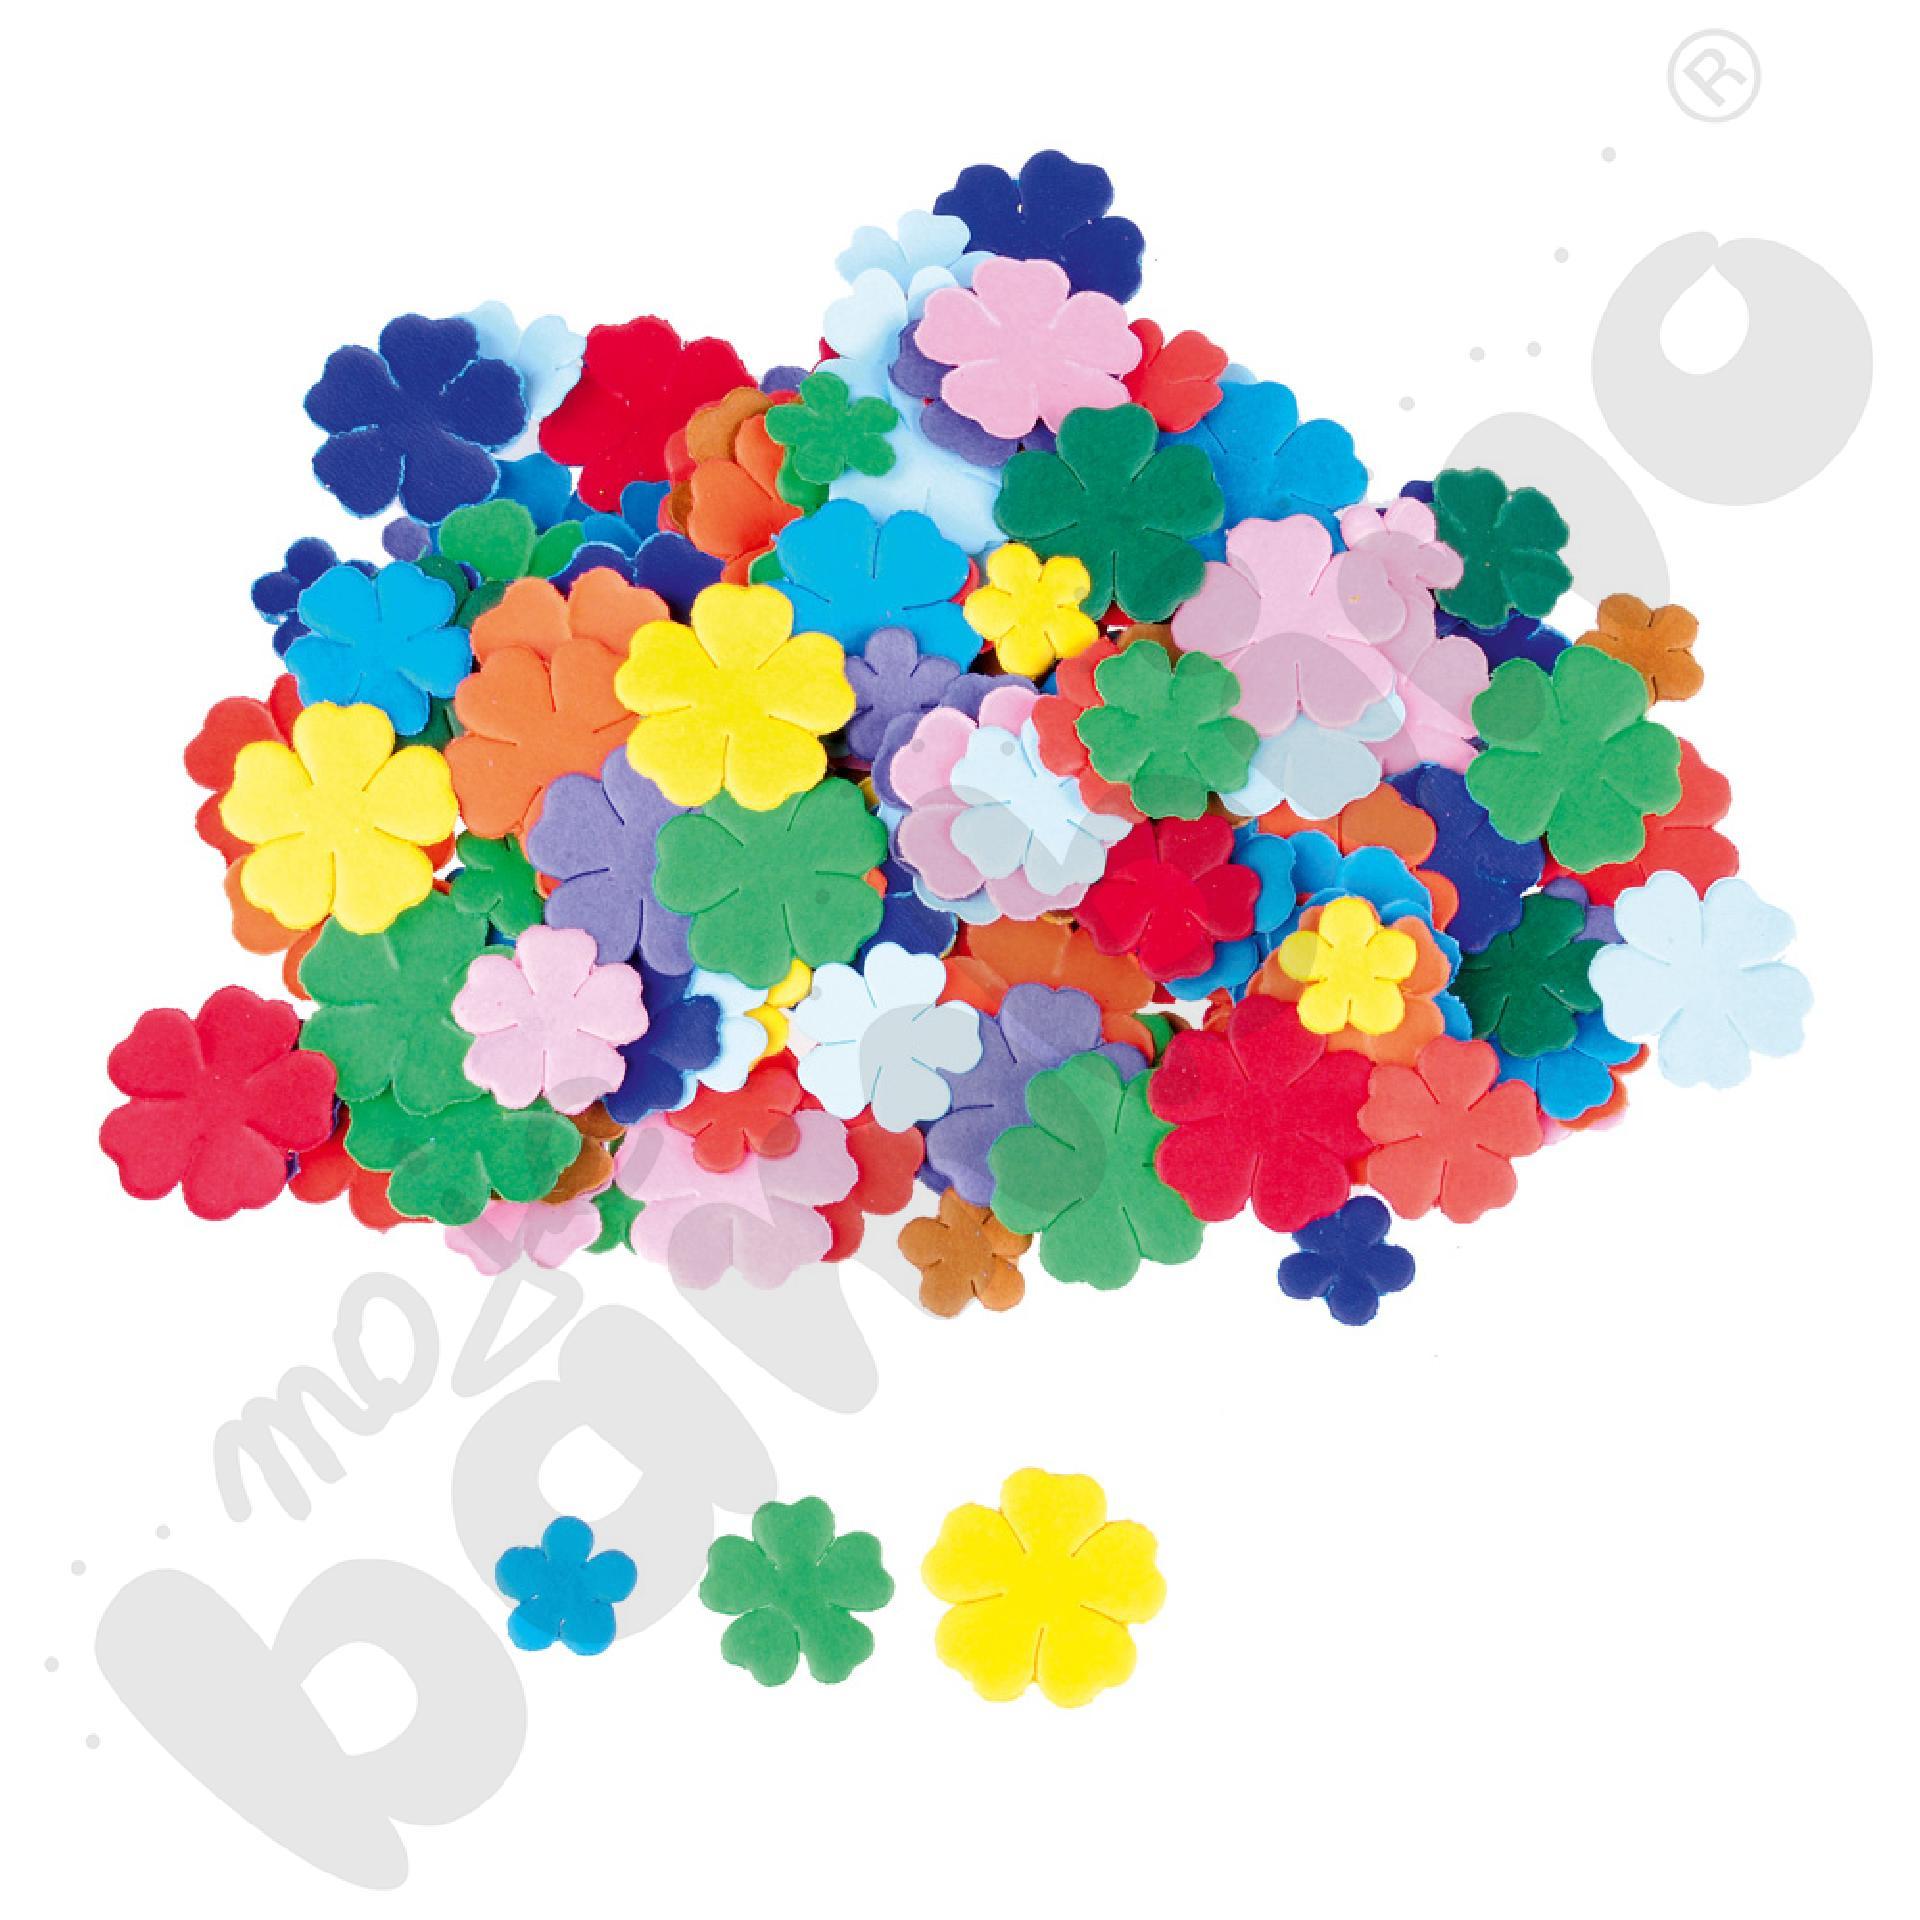 Kartonowe kwiatuszki